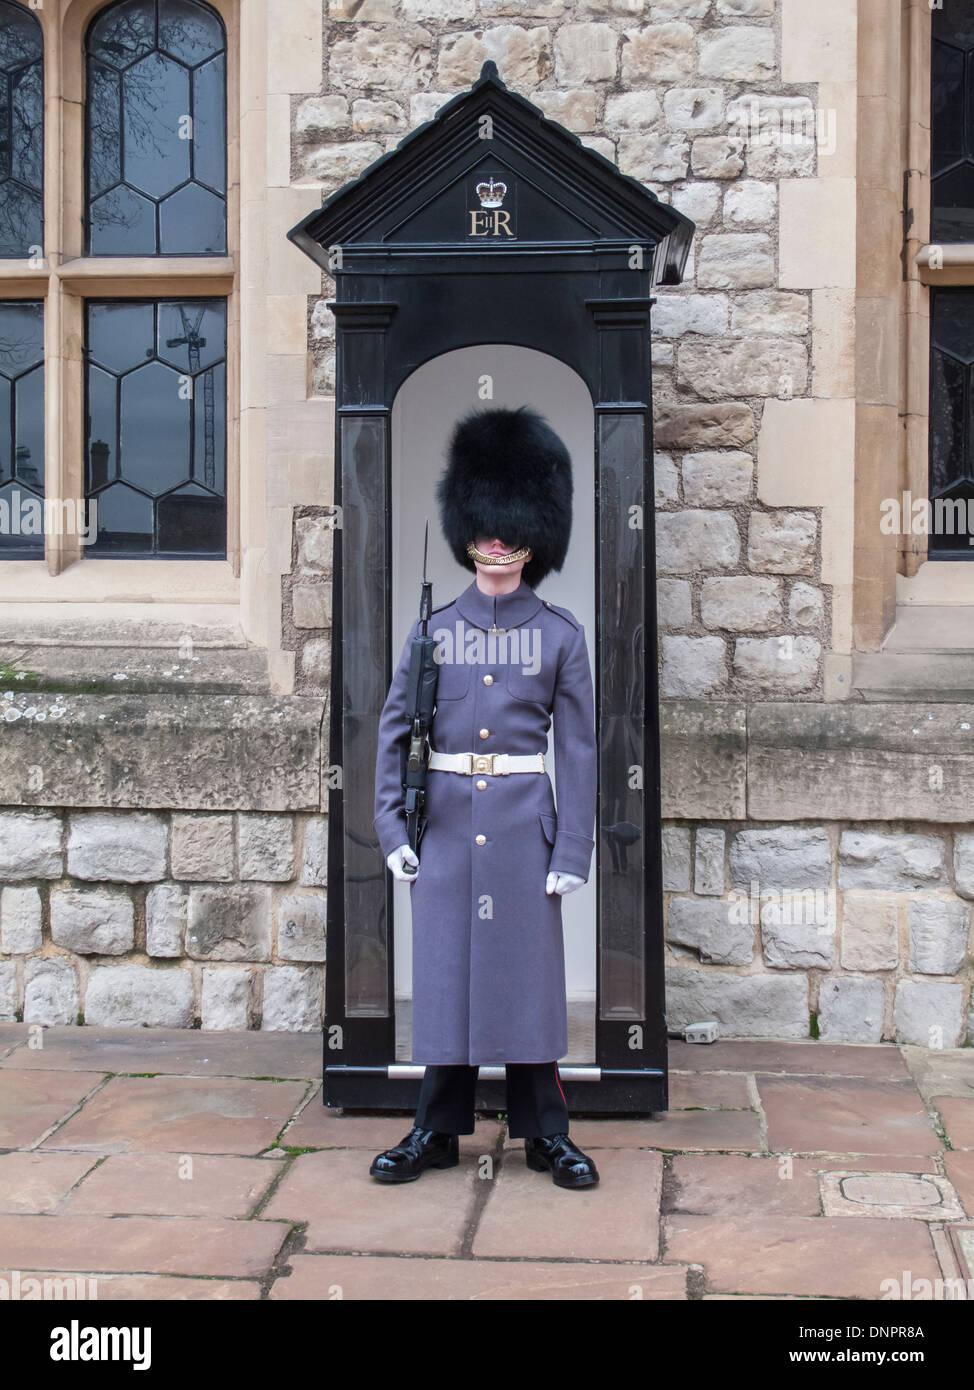 a8076d5d214 Queen s Guard Hat Stock Photos   Queen s Guard Hat Stock Images - Alamy